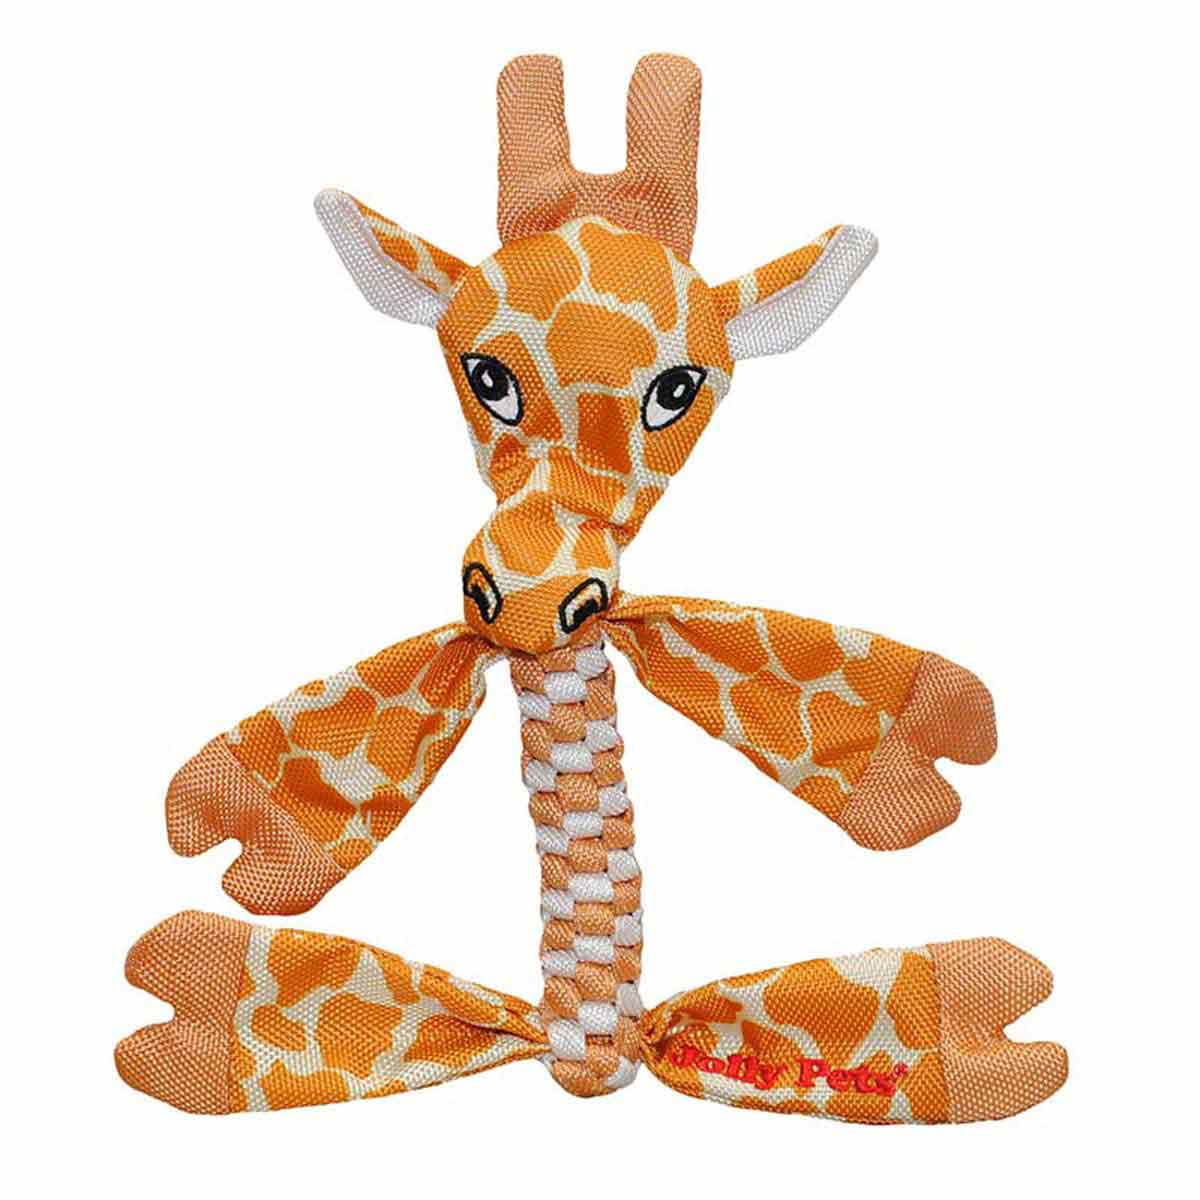 Small Giraffe Jolly Pet Animal Flathead Rope Dog Toy at Ryan's Pet Supplies